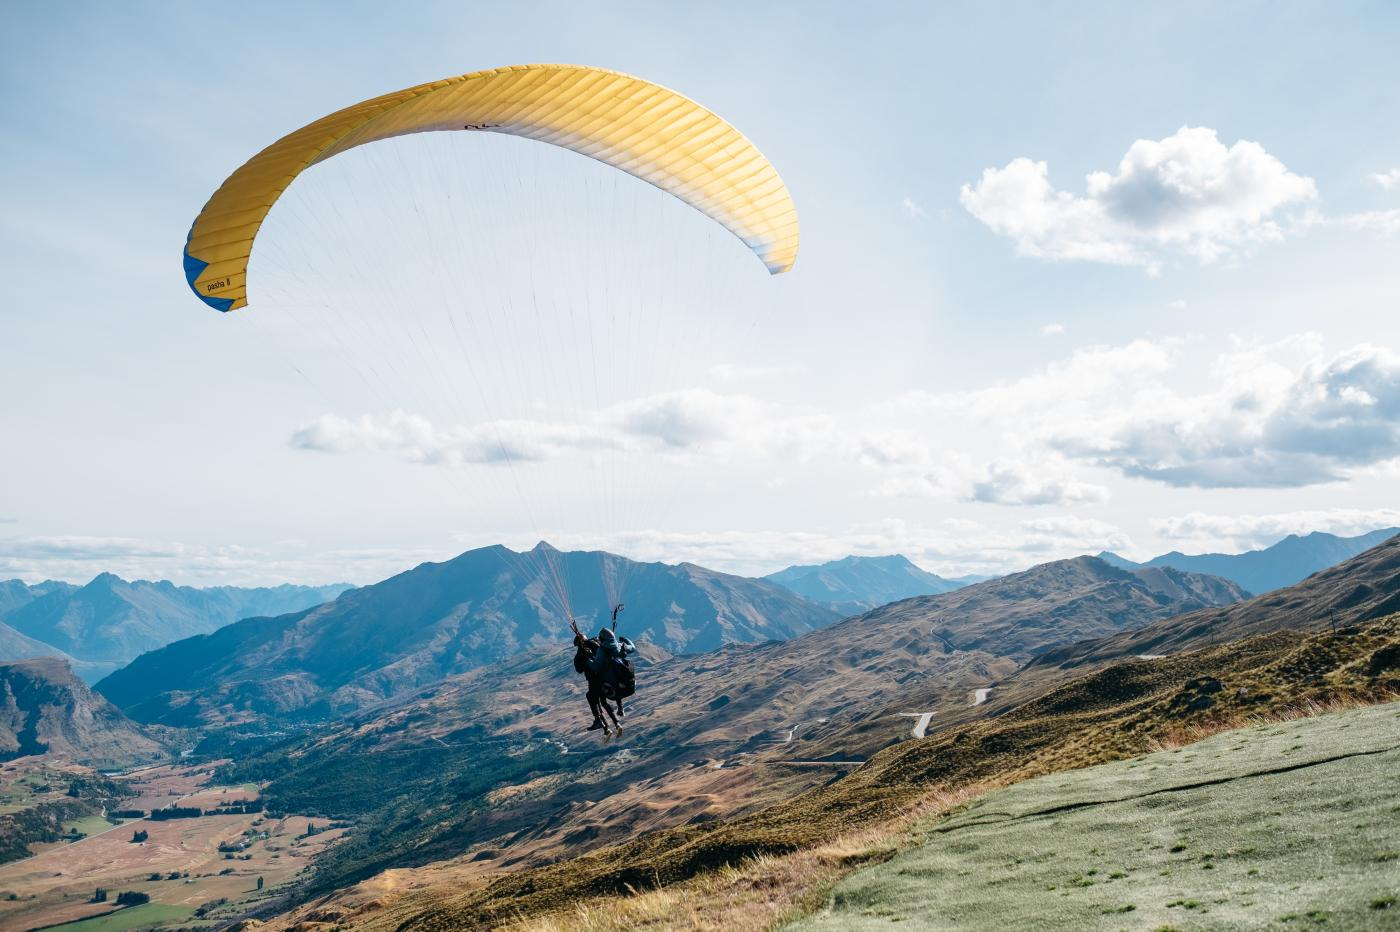 Paragliding Coronet Peak Shot by @pabloheimplatz